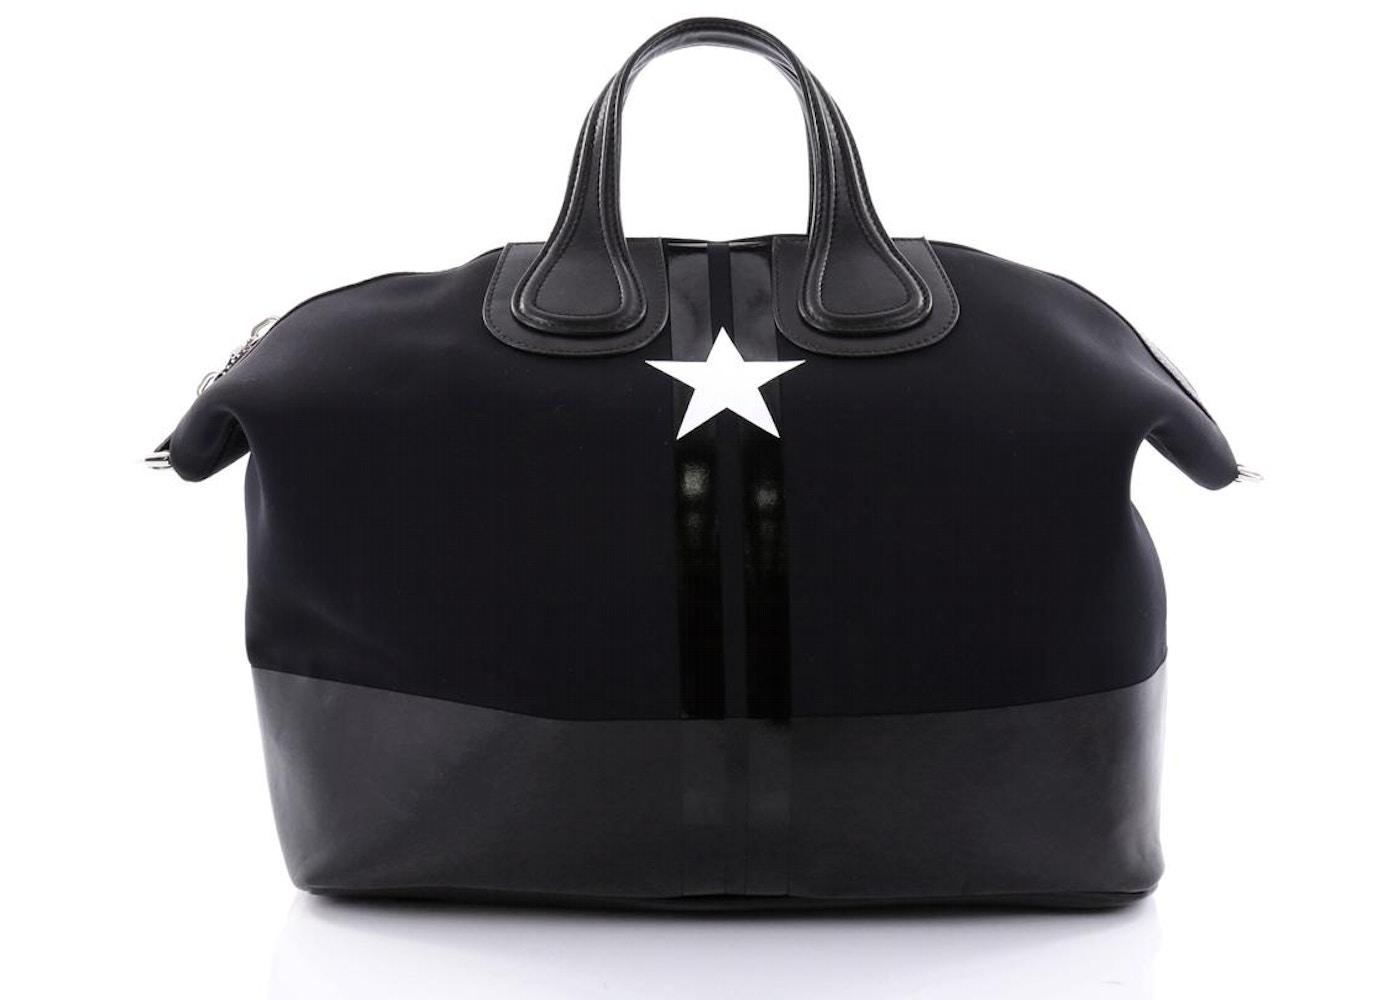 fc93f14b85c4 Buy   Sell Givenchy Nightingale Handbags - Average Sale Price